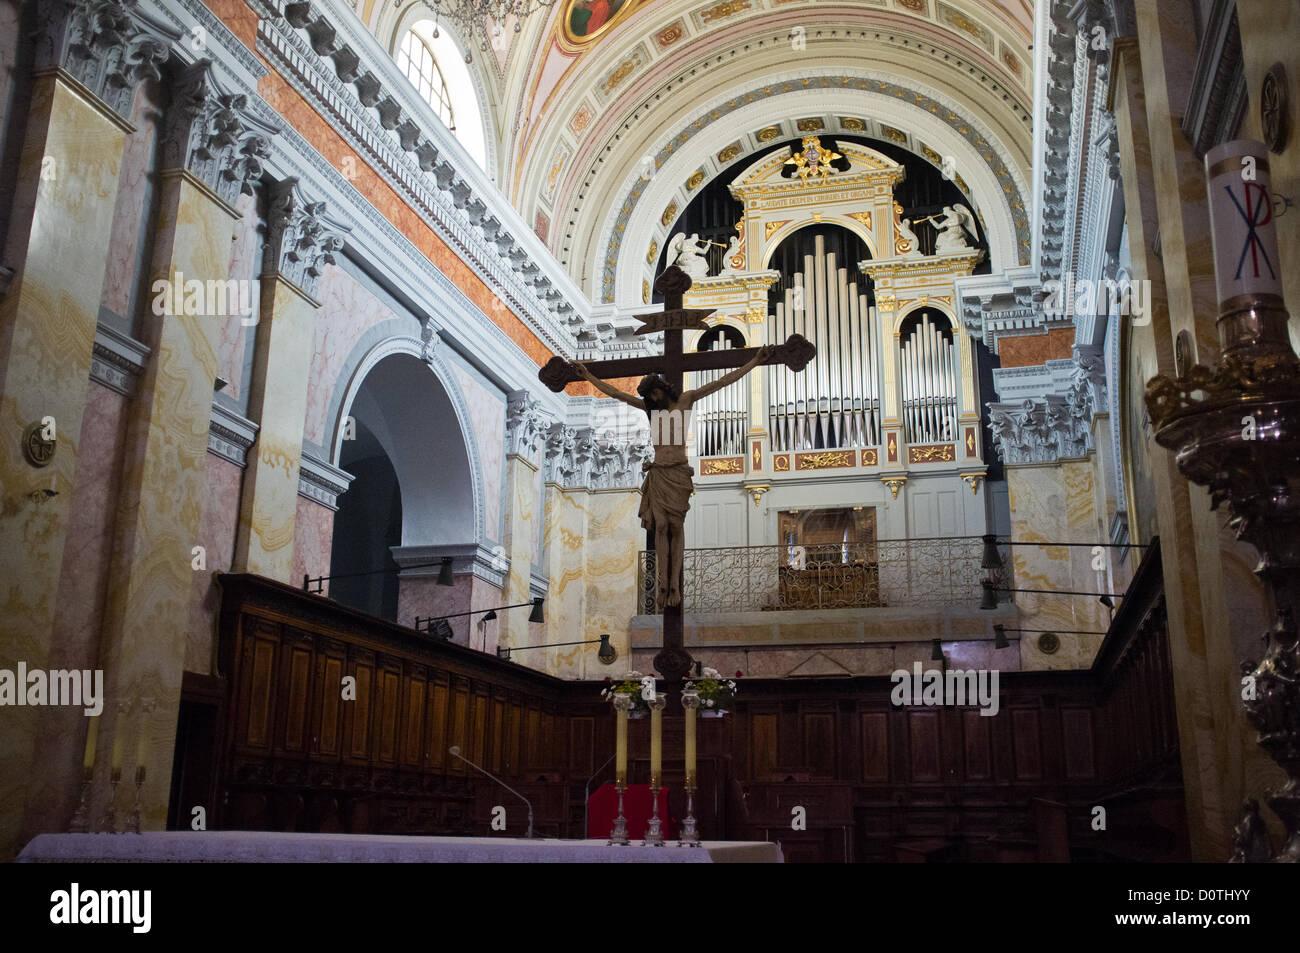 Jerusalem, Israel. 30. November 2012. Im spanischen Stil, 16. Jh., Kirche des Heiligen Erlösers Kloster. Jerusalem, Stockbild